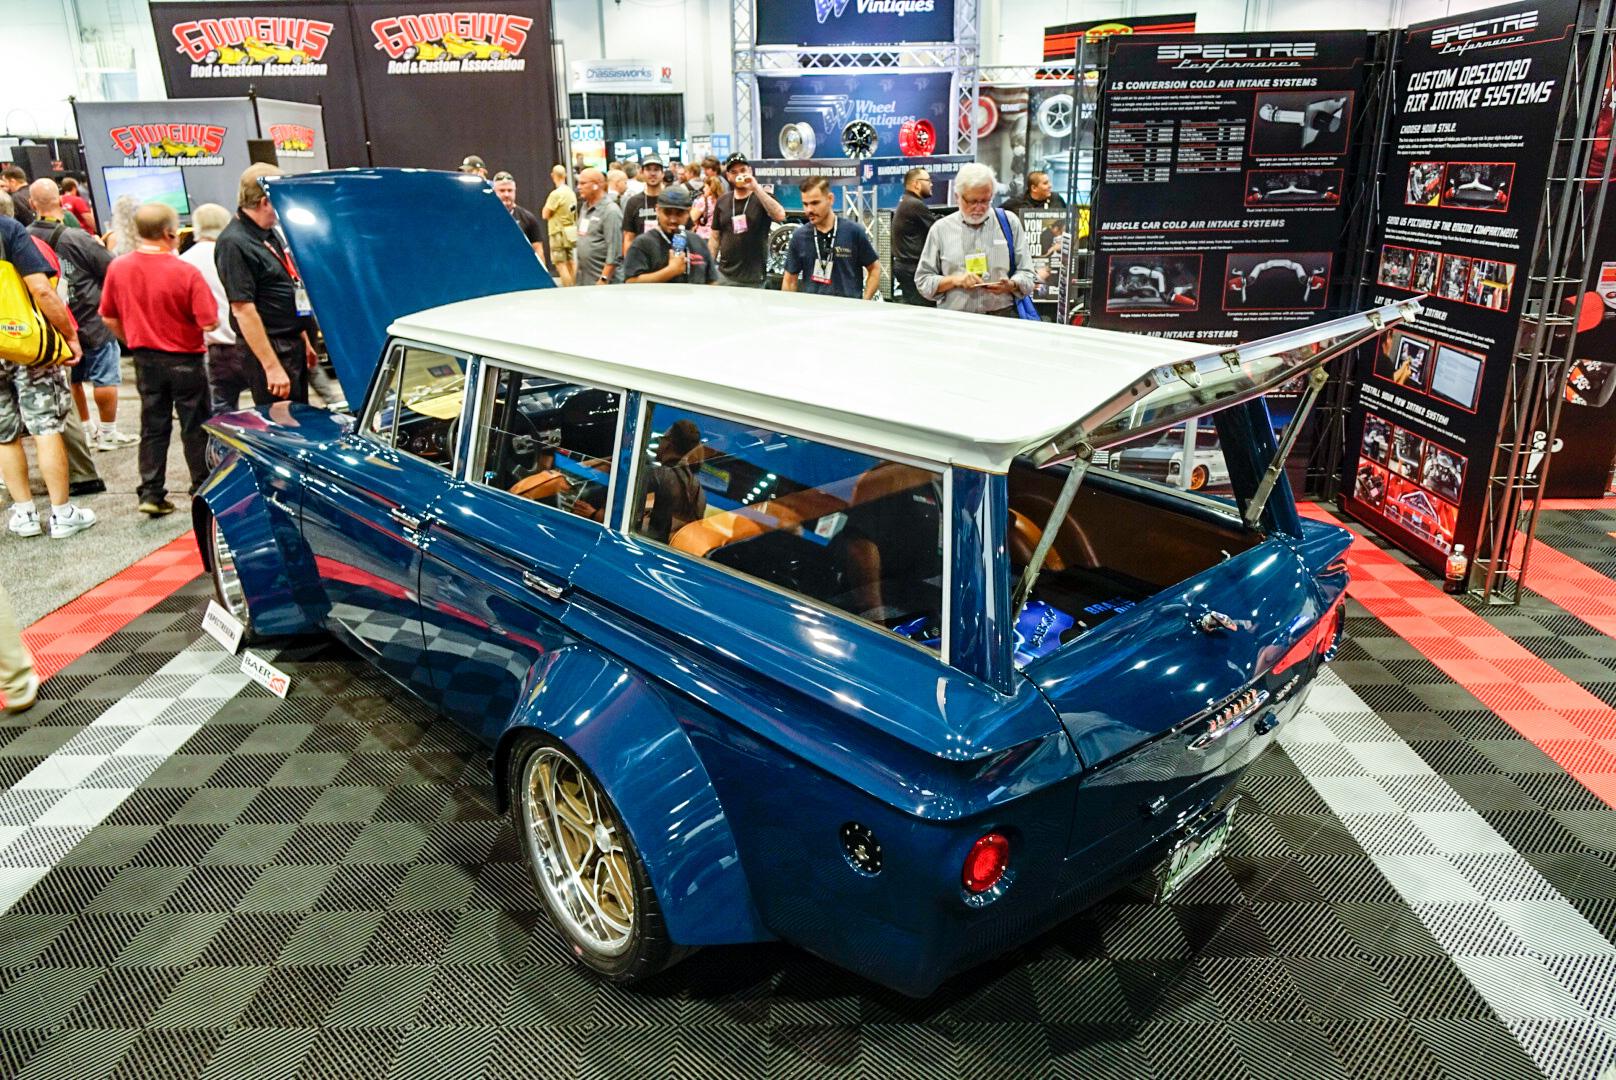 Bauter's 1963 wide-body AMC Rambler American 220 Wagon